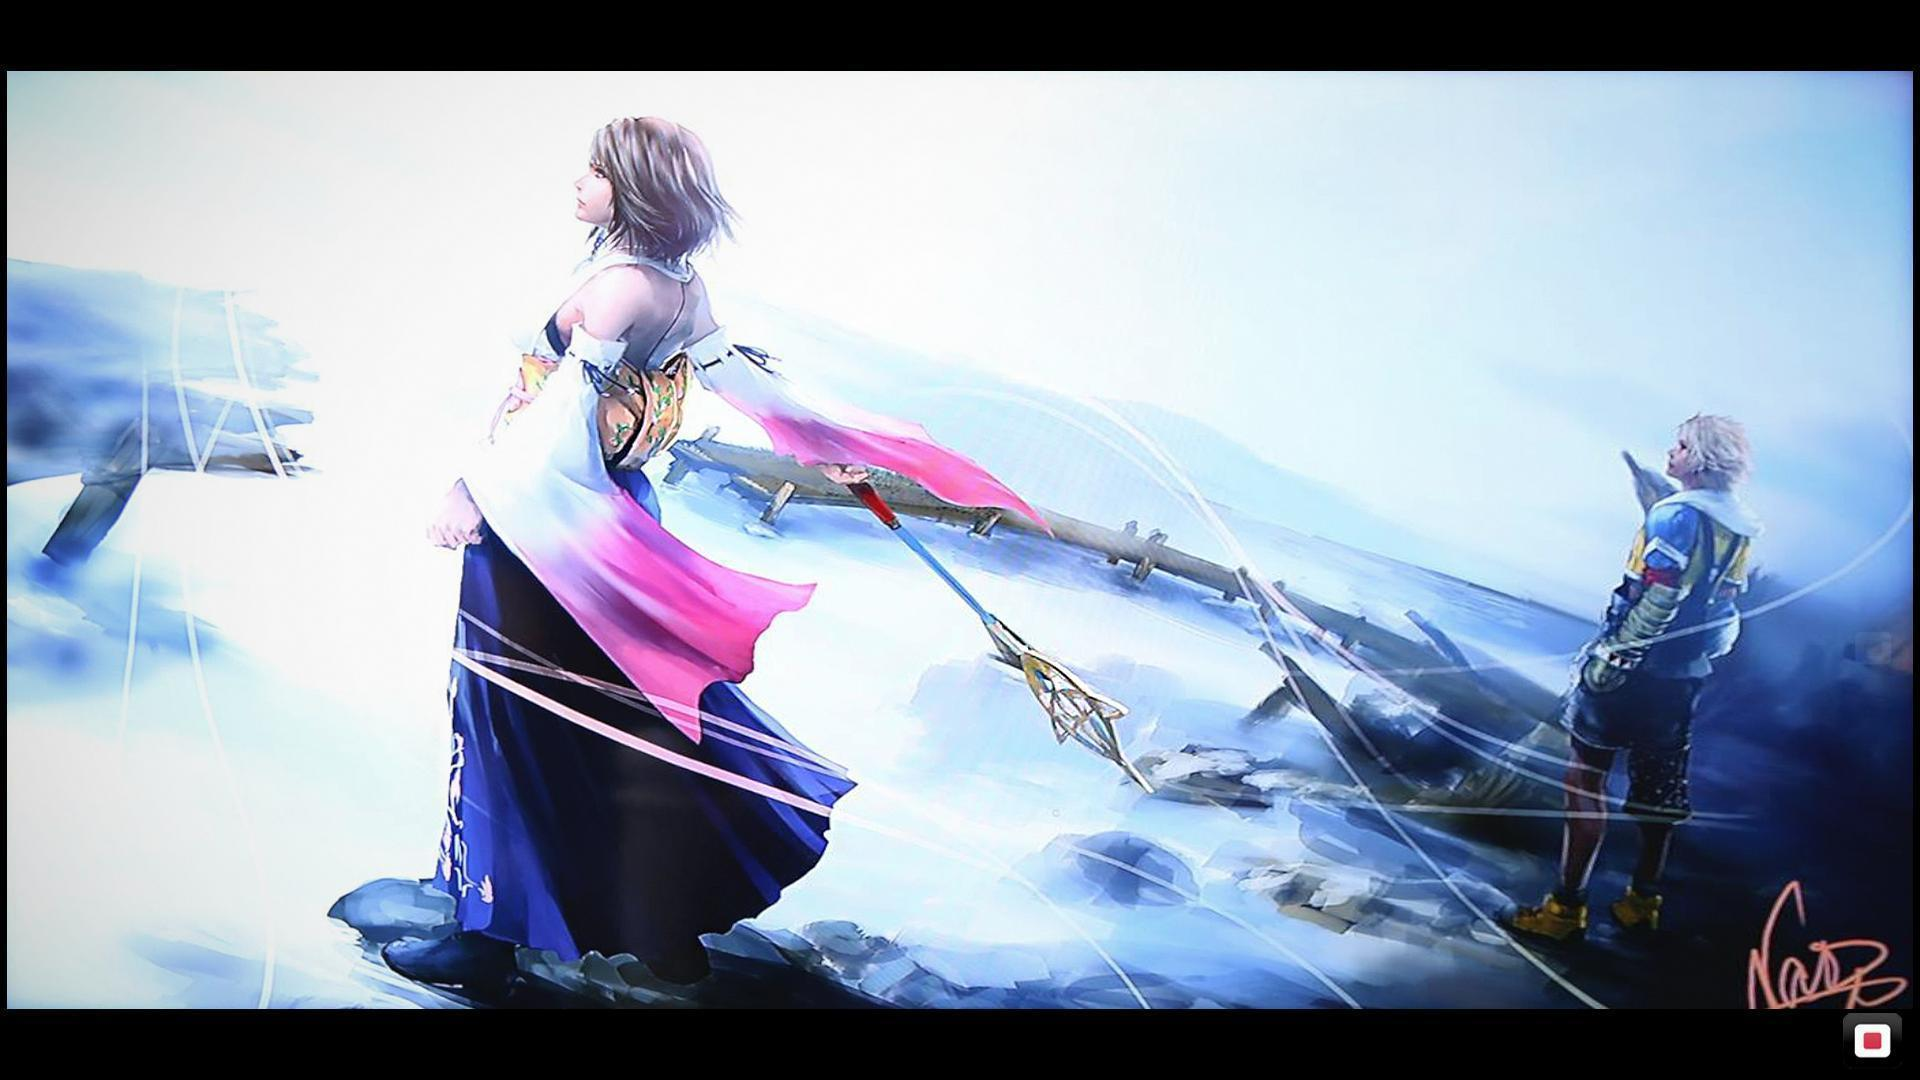 Final Fantasy X Wallpapers 1920x1080